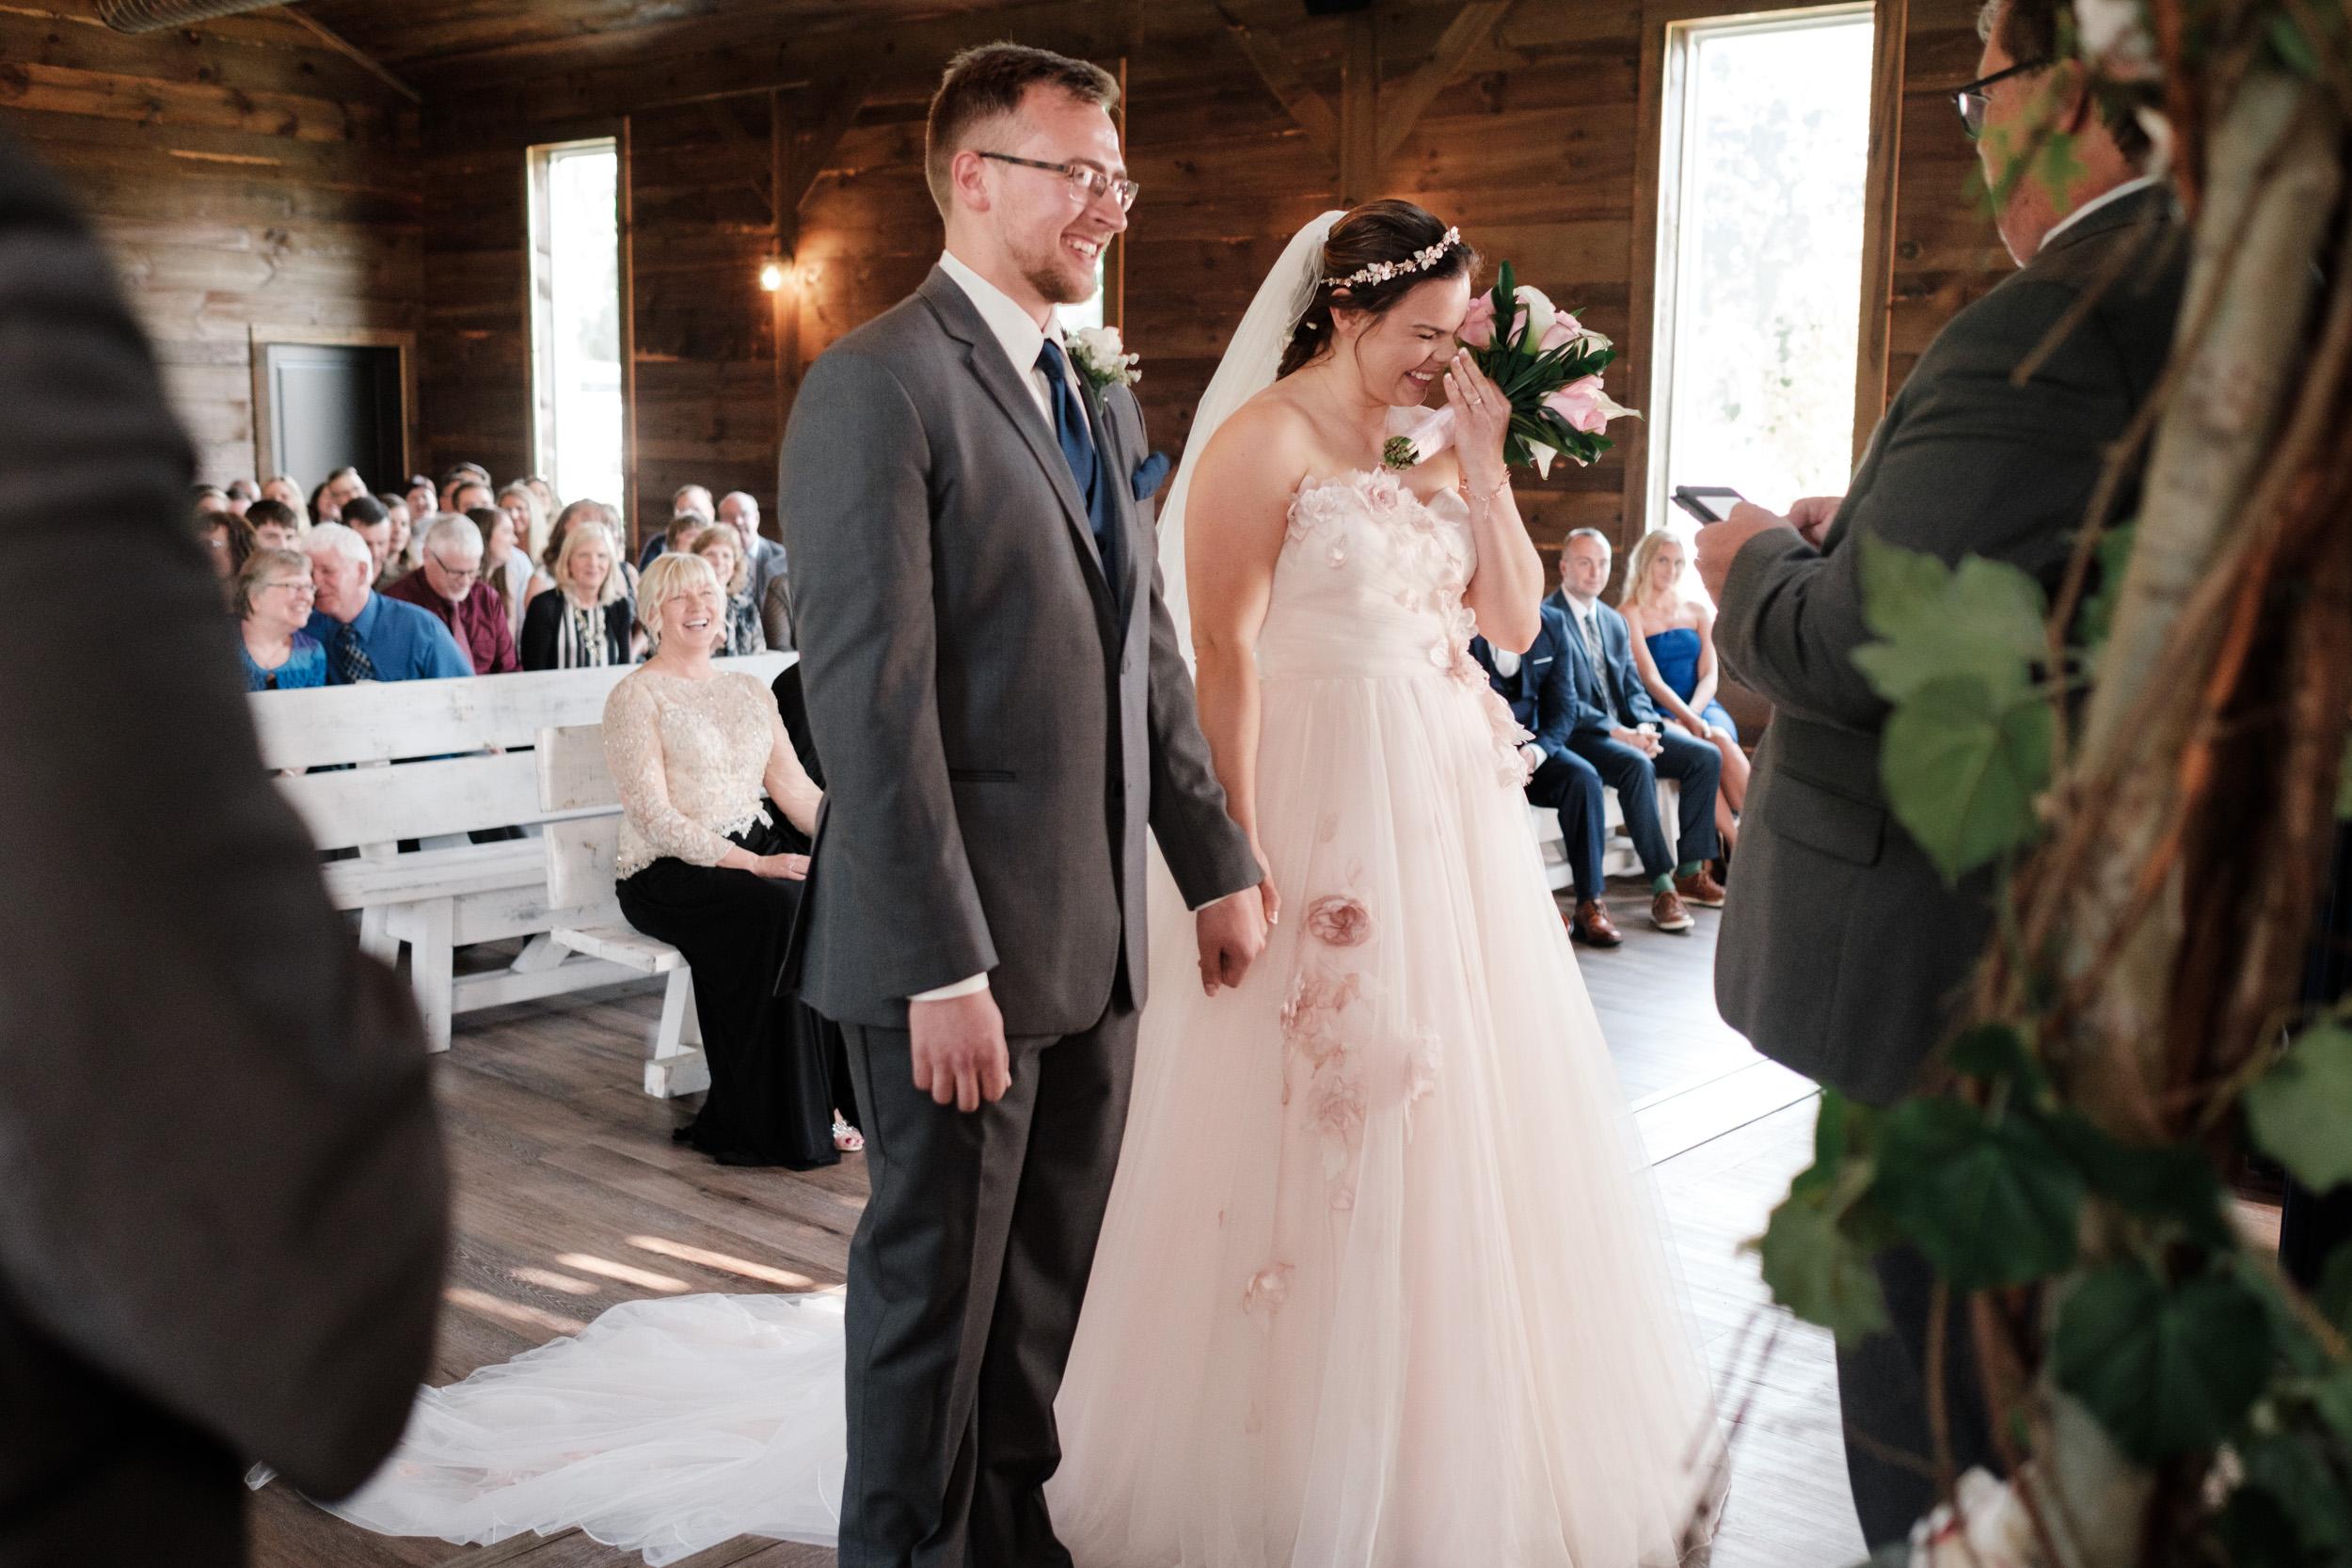 19-06-22-Ryan-Katie-The-Fields-Reserve-Wedding-30.jpg